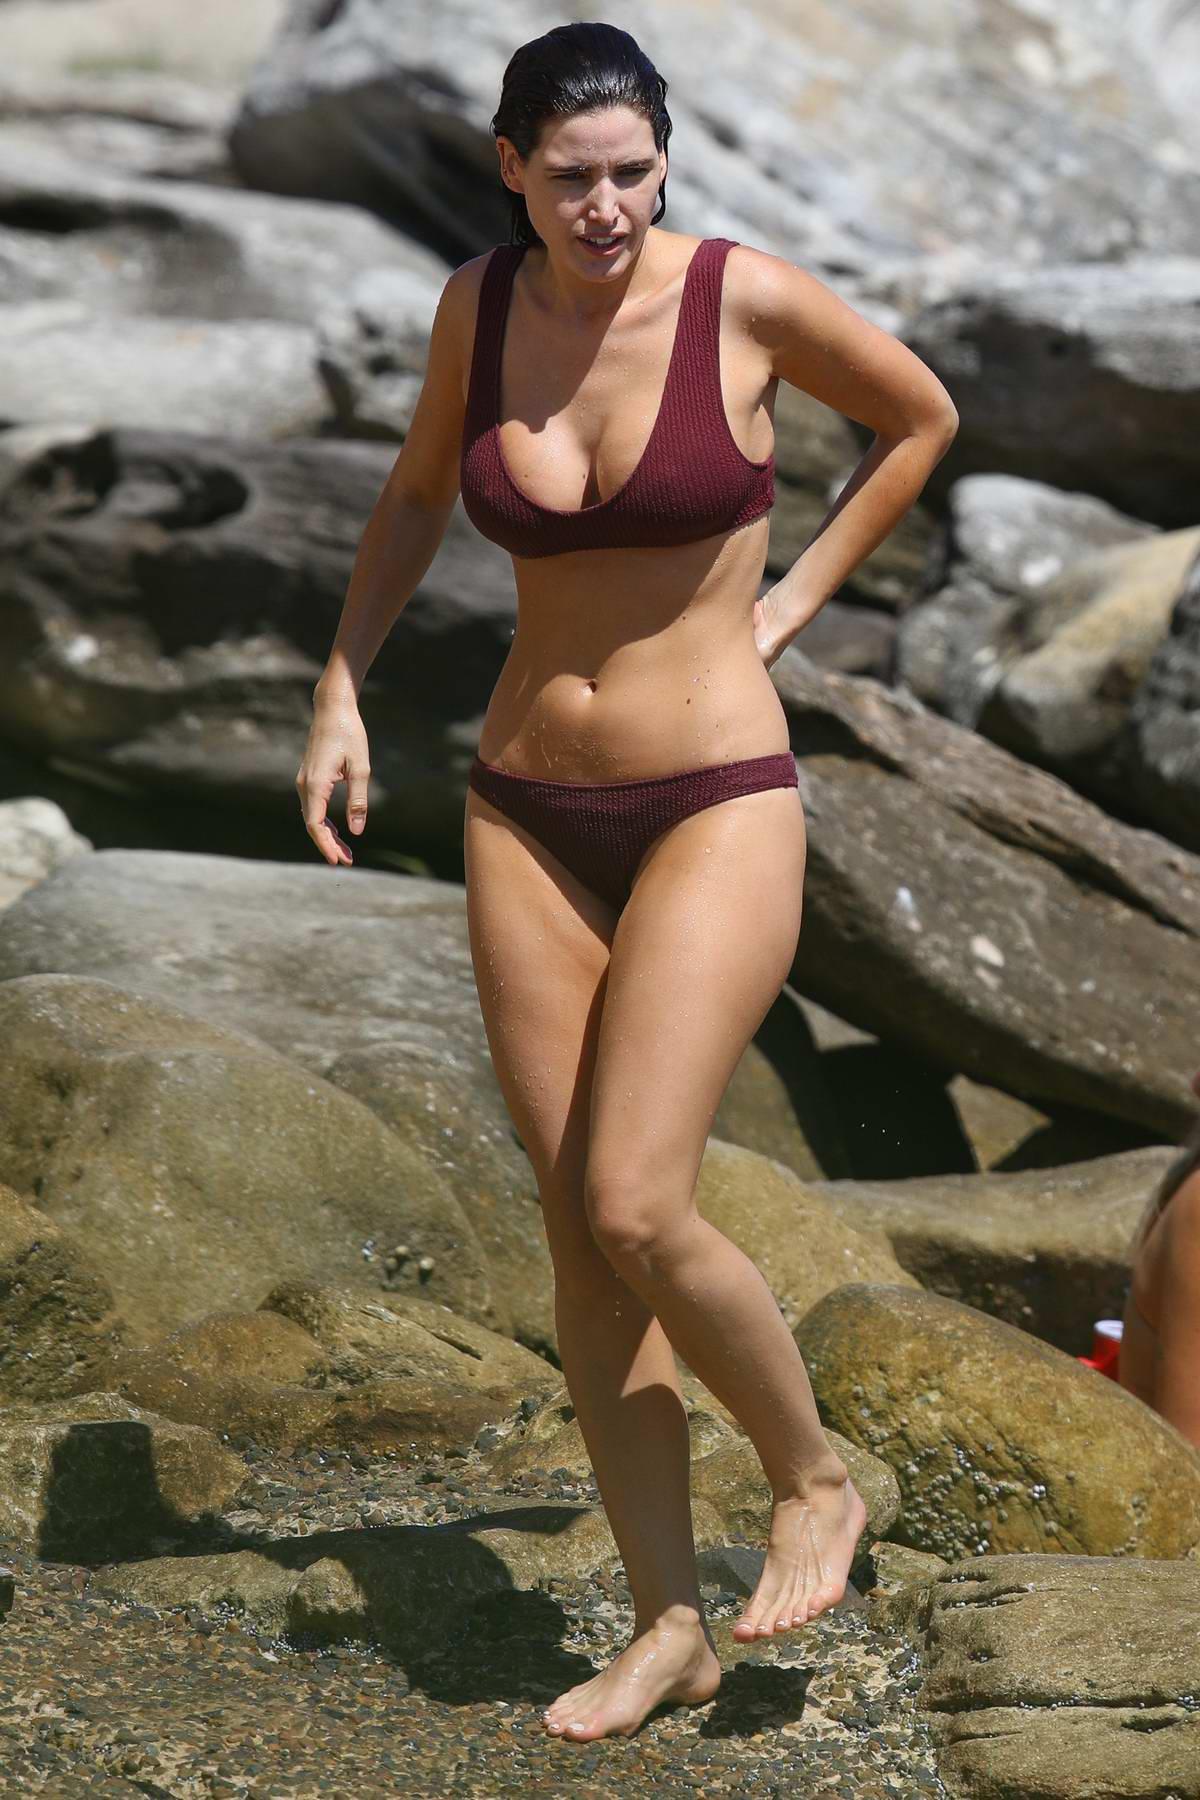 Tahnee Atkinson spotted in a bikini as she enjoys a swim at Bondi beach in Sydney, Australia